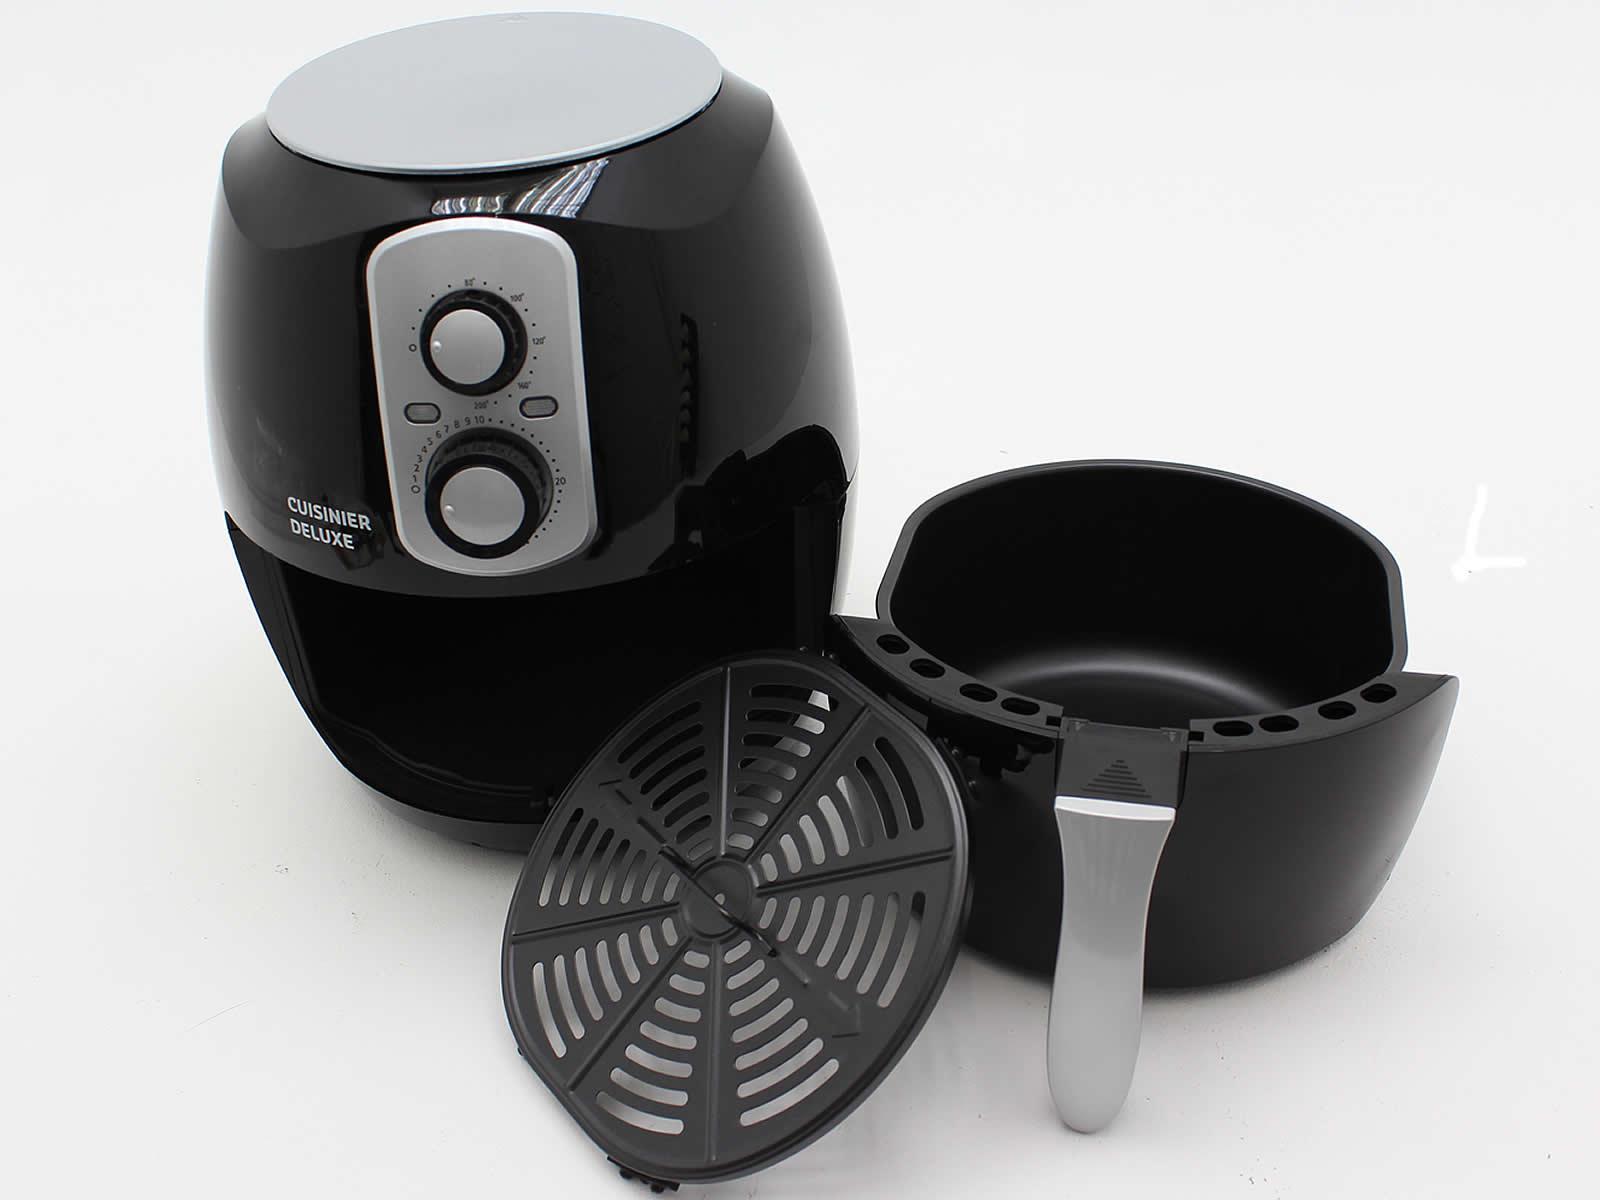 Heißluft Fritteuse Fettfrei Ofen Heißluftfriteuse 3,6L Grill Heißluftofen Ölfrei